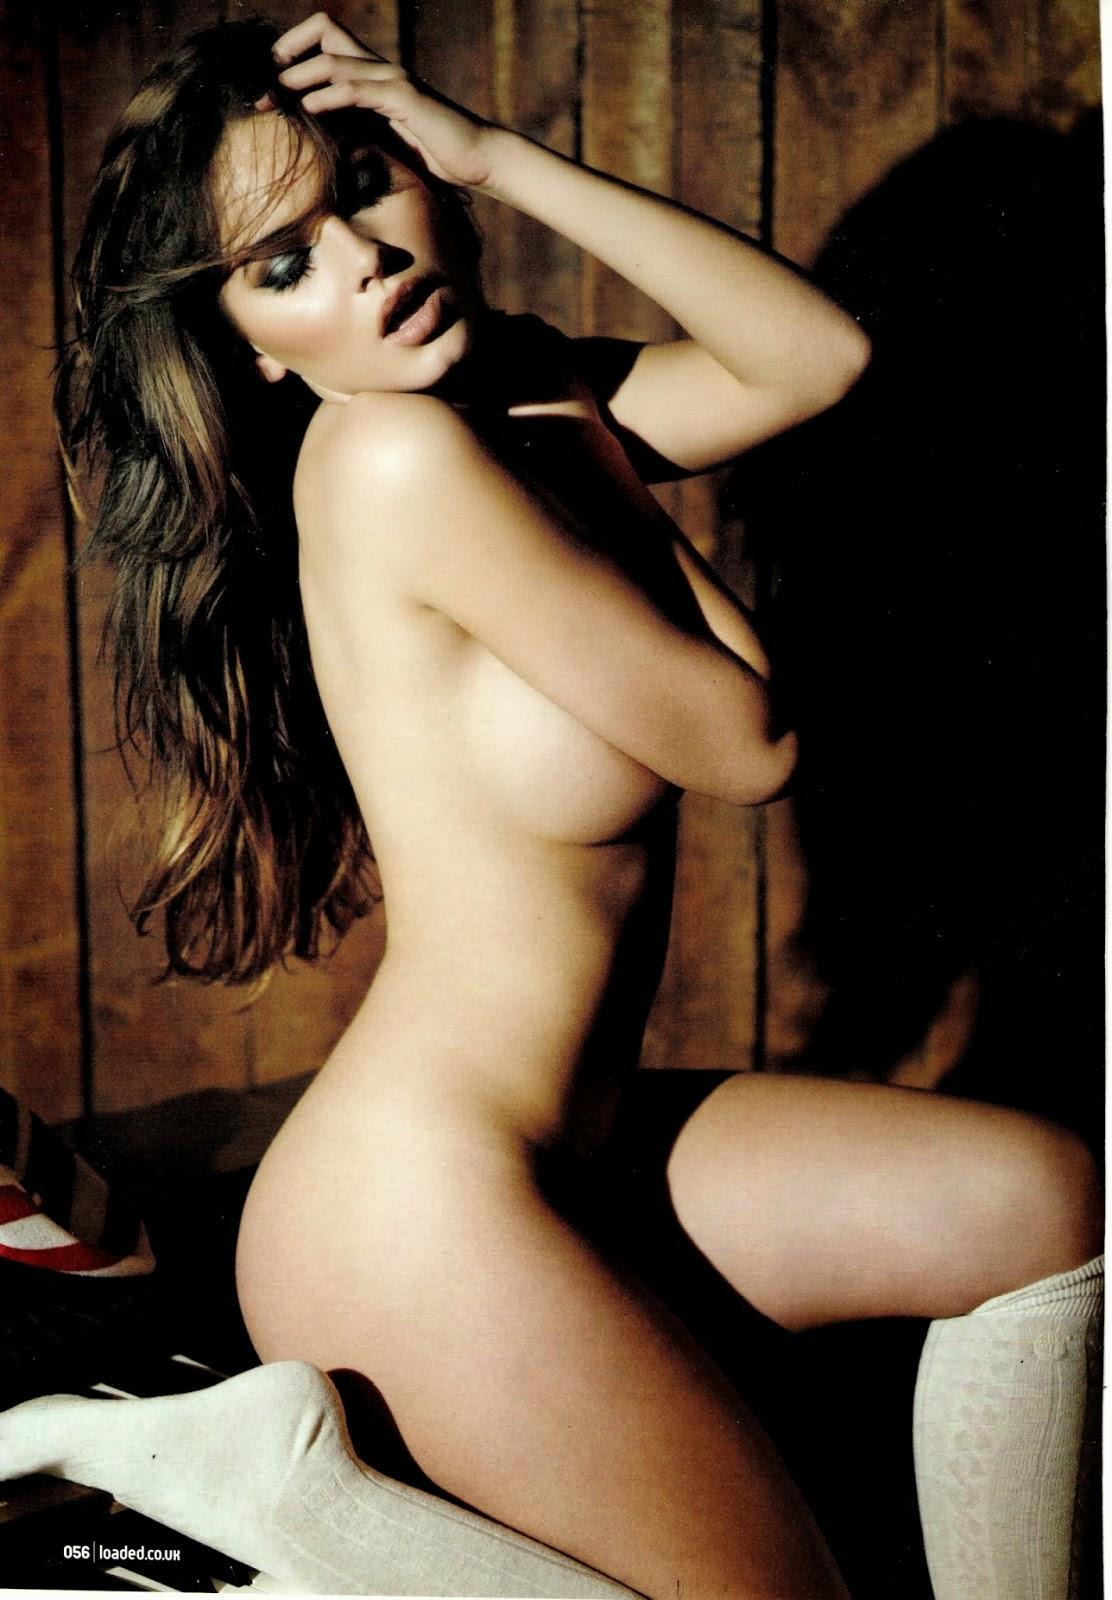 chica 1x2, Sabine Jemeljanova, novia, John Carew, sexy, Hest Ham, Valencia, tetas, cuerpo, morena, modelo, calendario, culo, desnuda